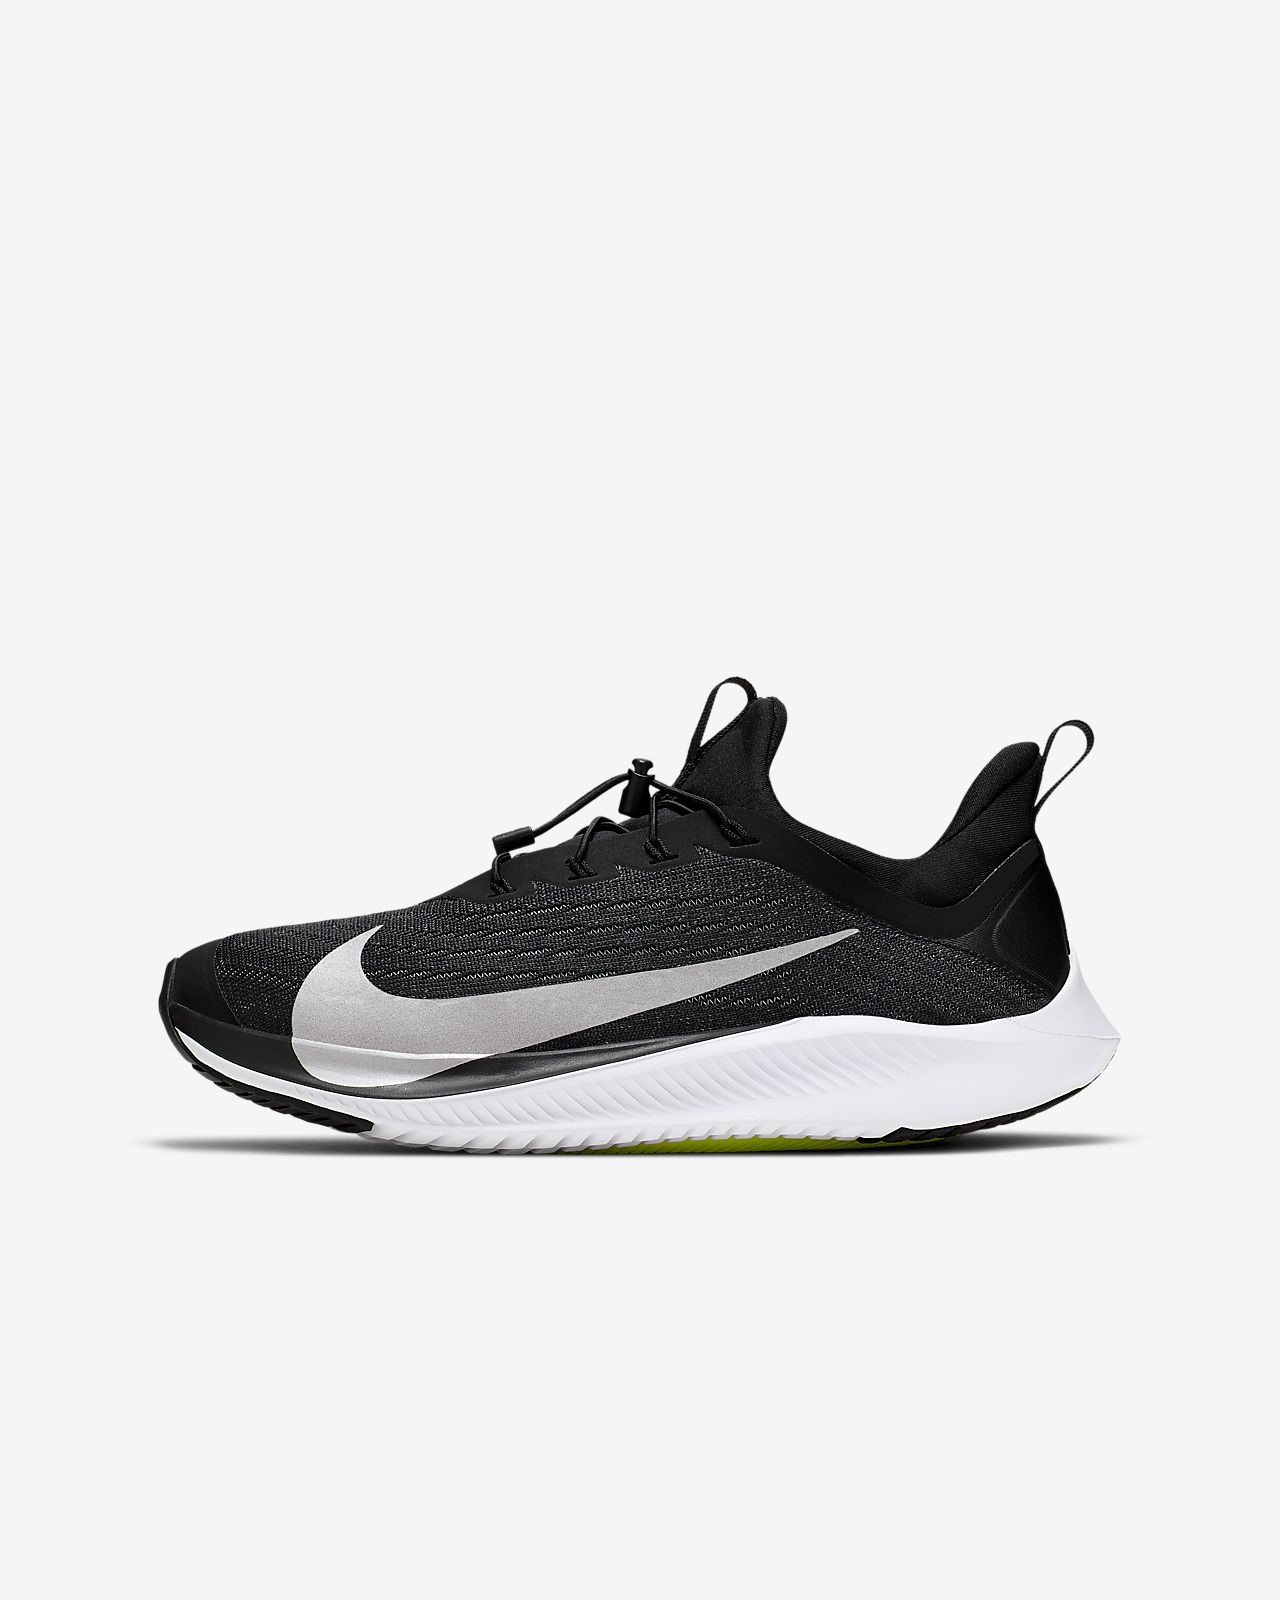 Nike Future Speed 2 Laufschuh für ältere Kinder